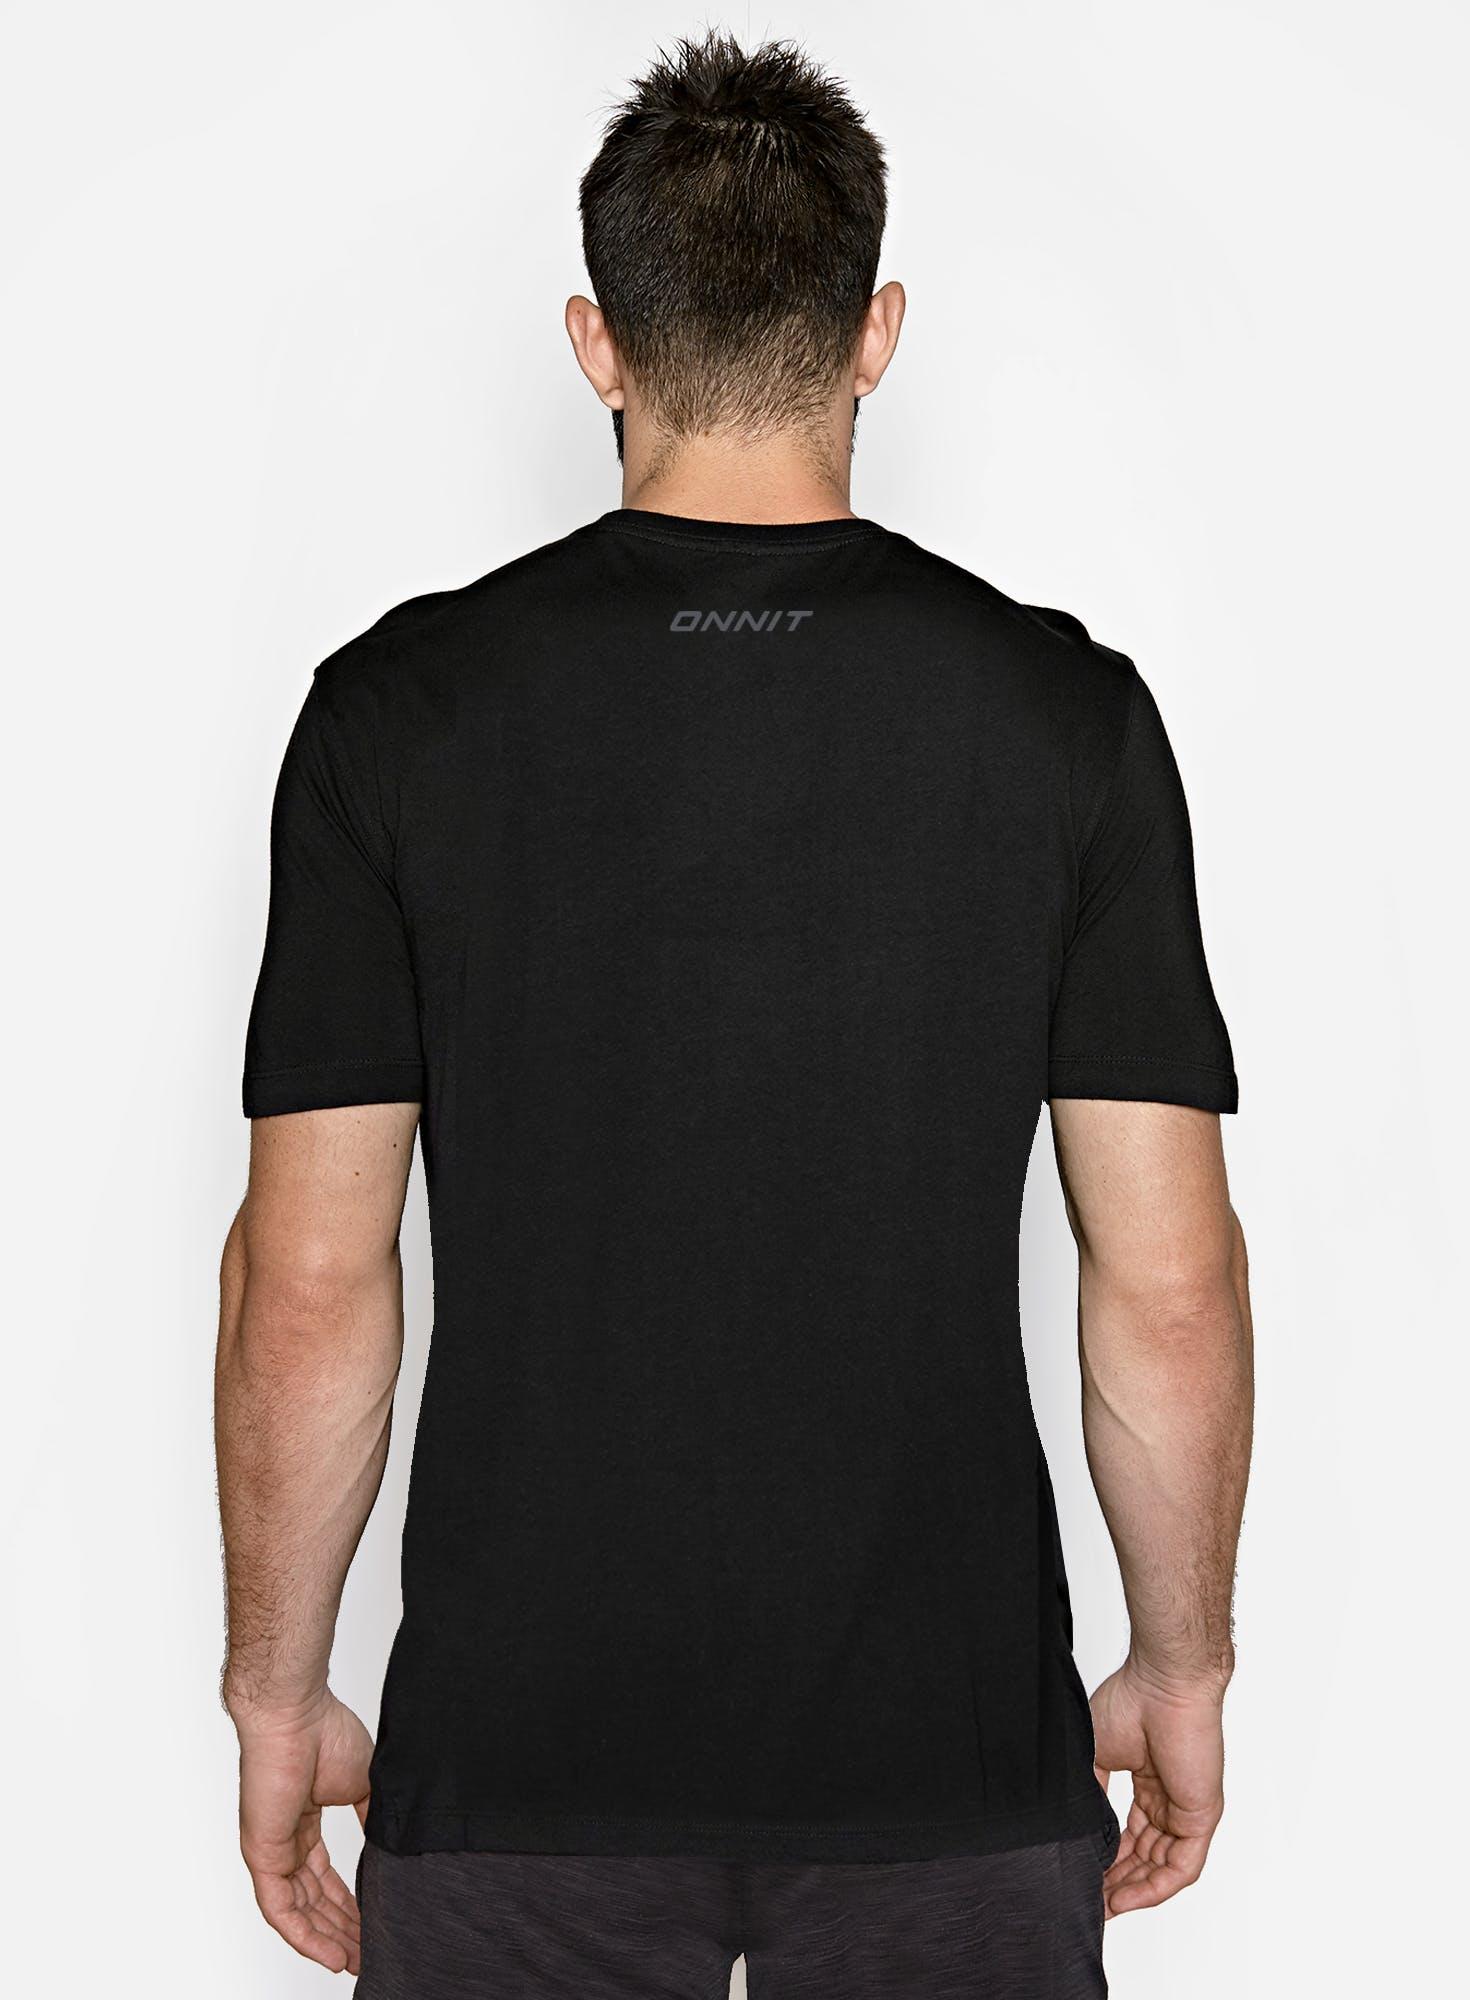 Primal Bamboo T-Shirt Bonus Image